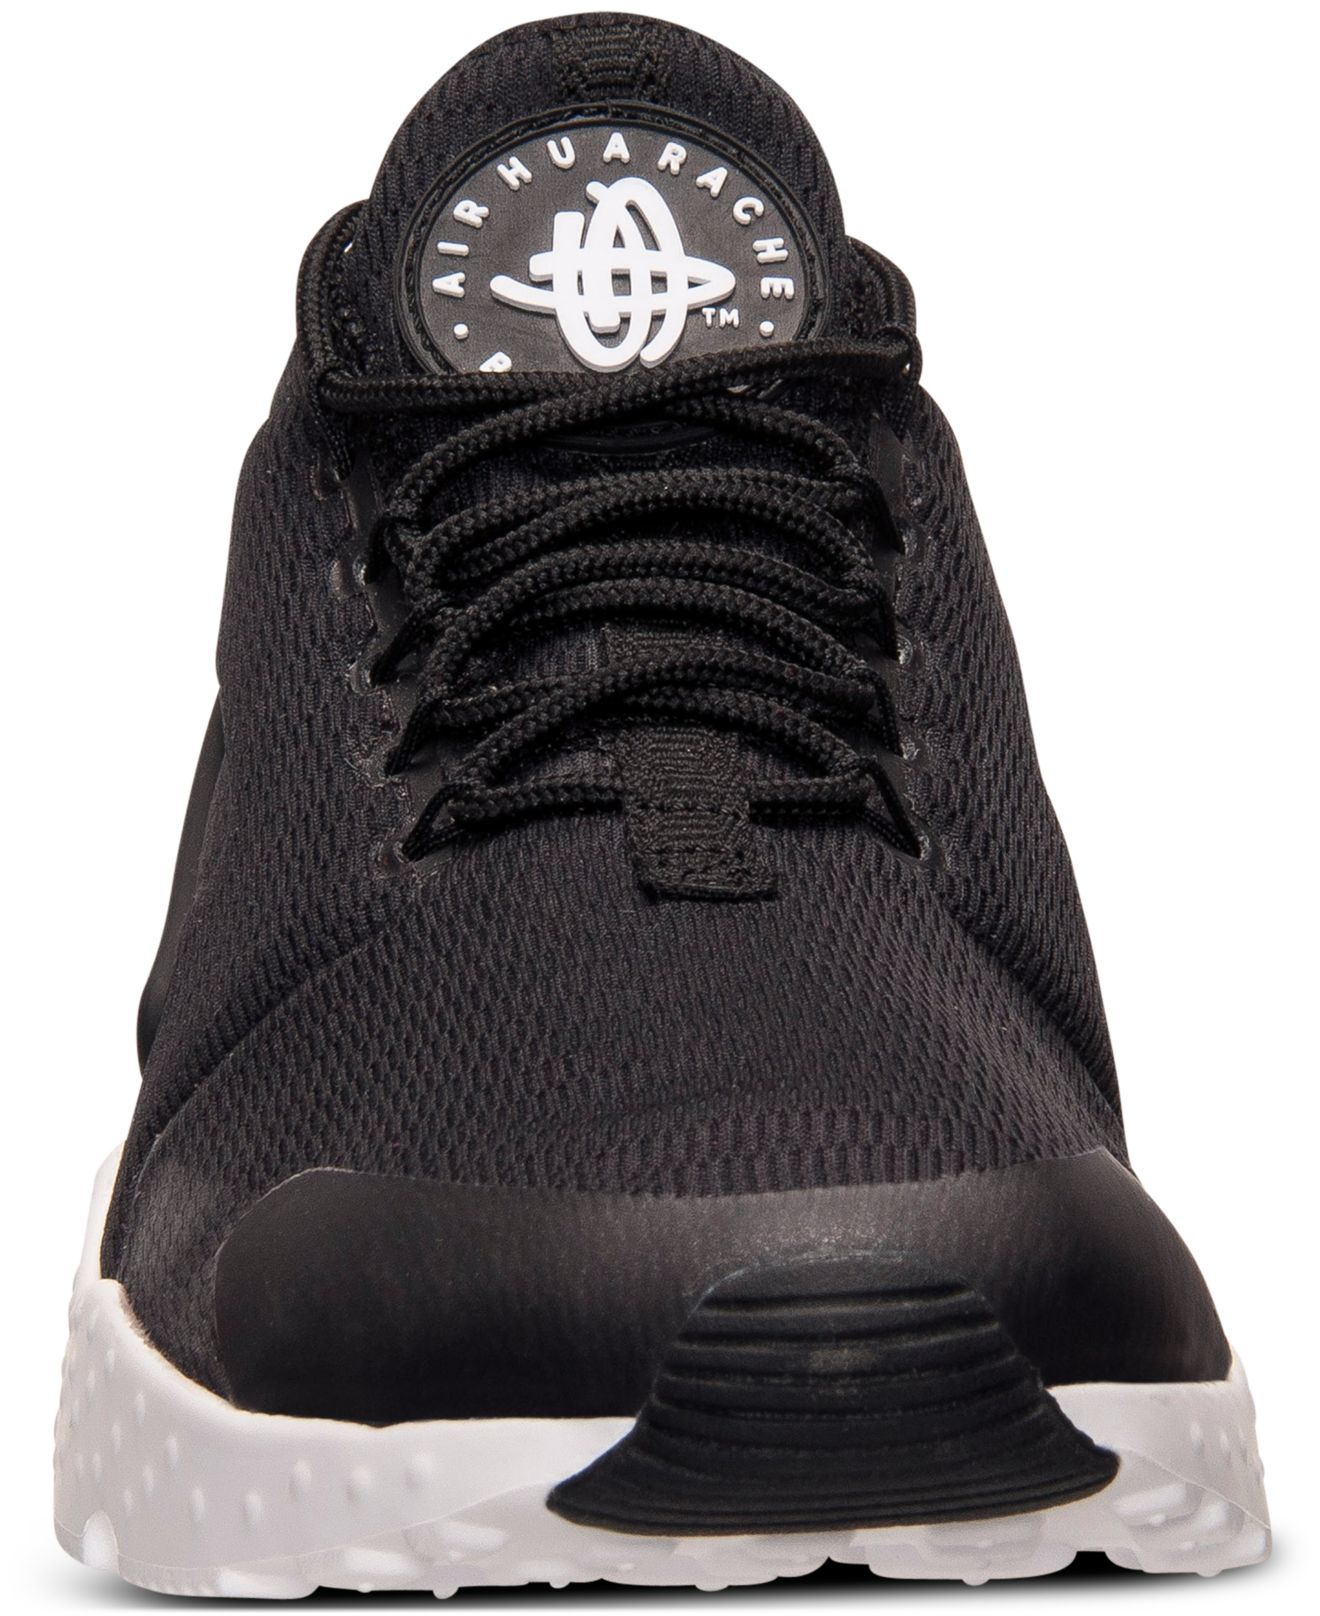 c159e6faa930 Lyst - Nike Women s Air Huarache Run Ultra Running Sneakers From ...